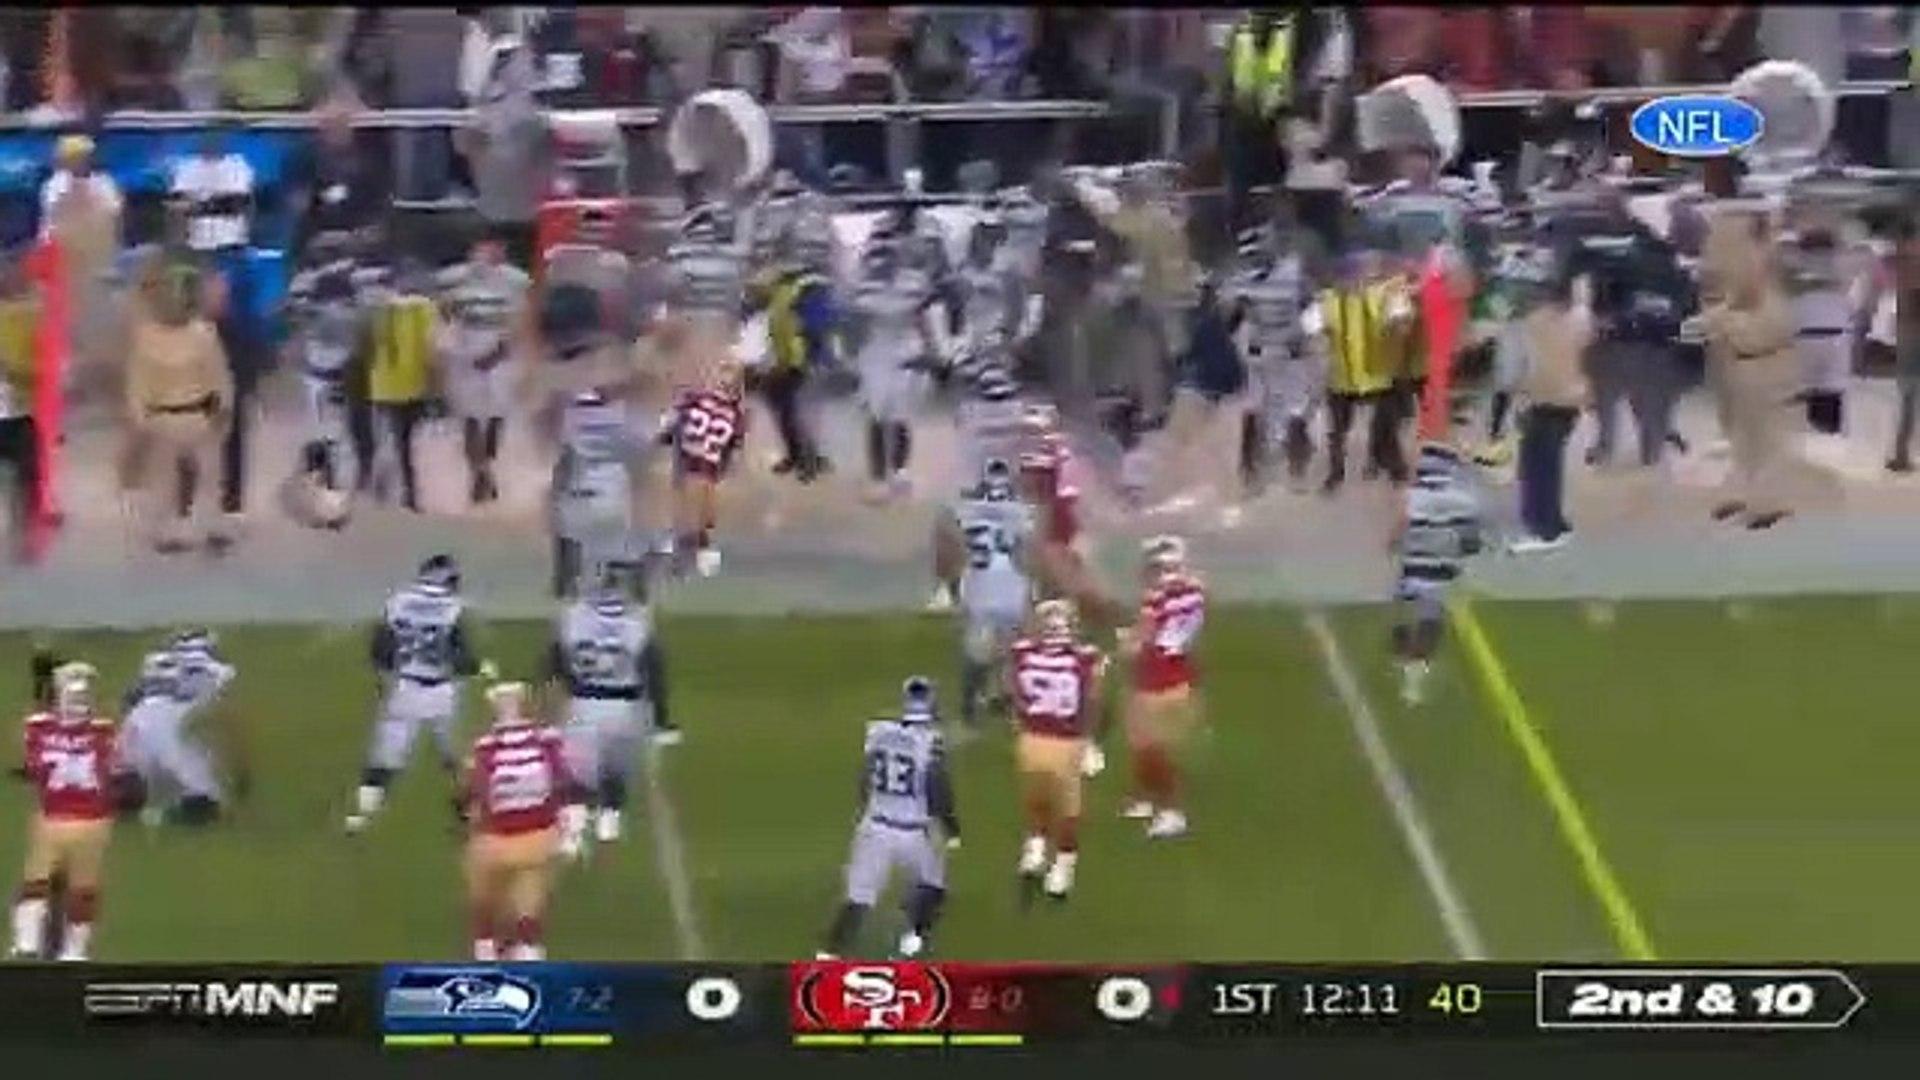 Seahawks vs 49ers Full game highlights | NFL week 10 November 11, 2019 | 11/11/19